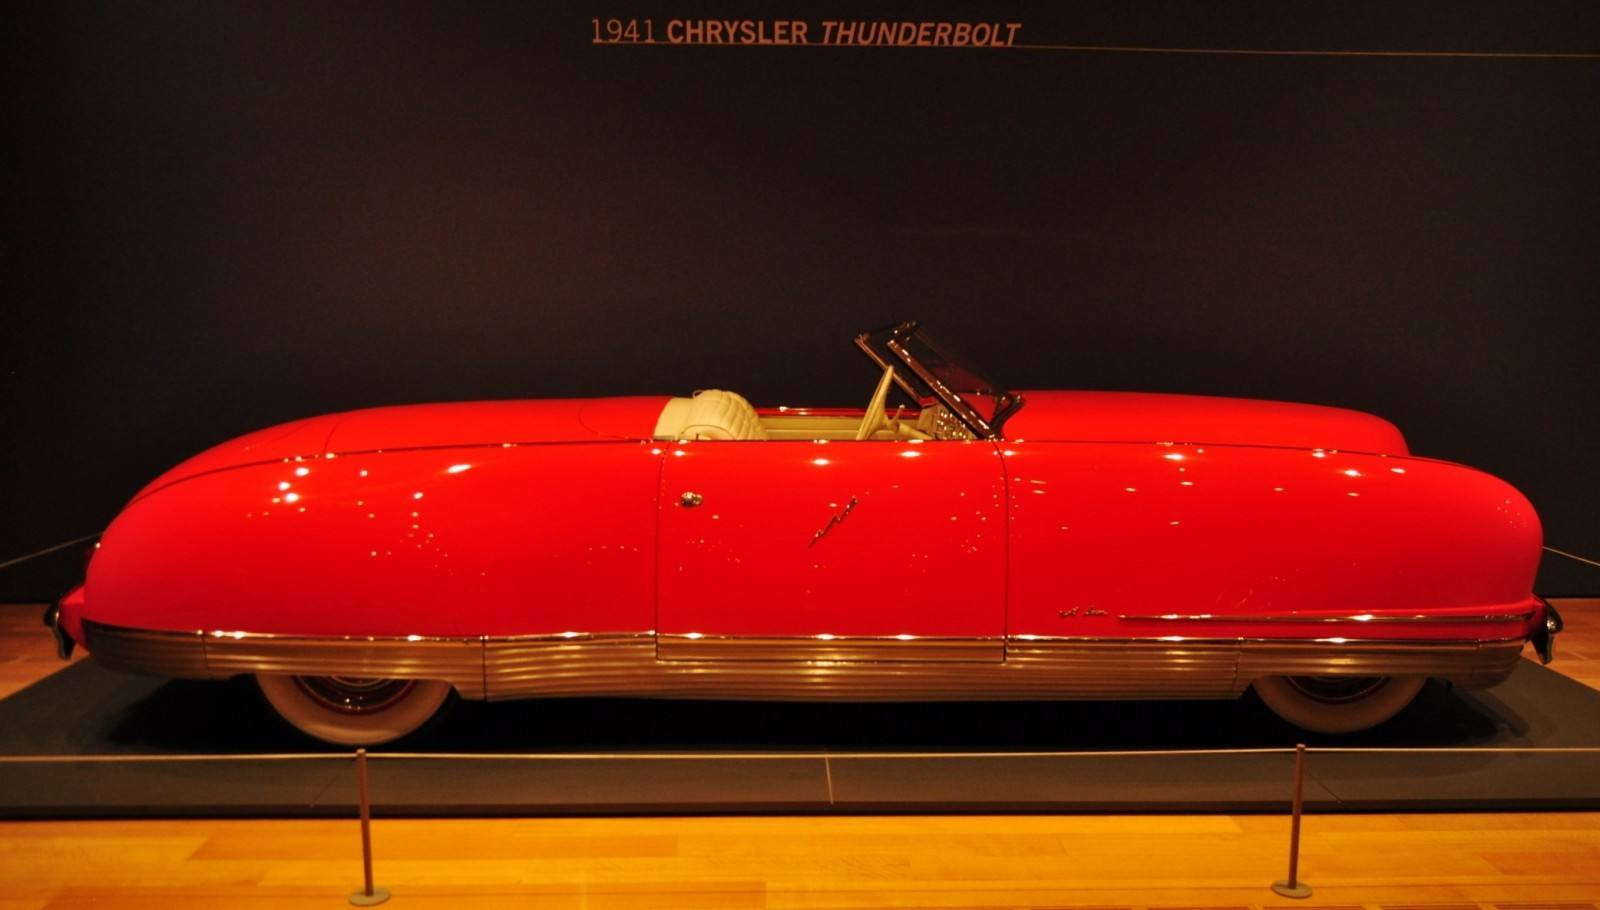 Atlanta Dream Cars Showcase - 1941 Chrysler Thunderbolt Is Aero Convertible Coupe 18